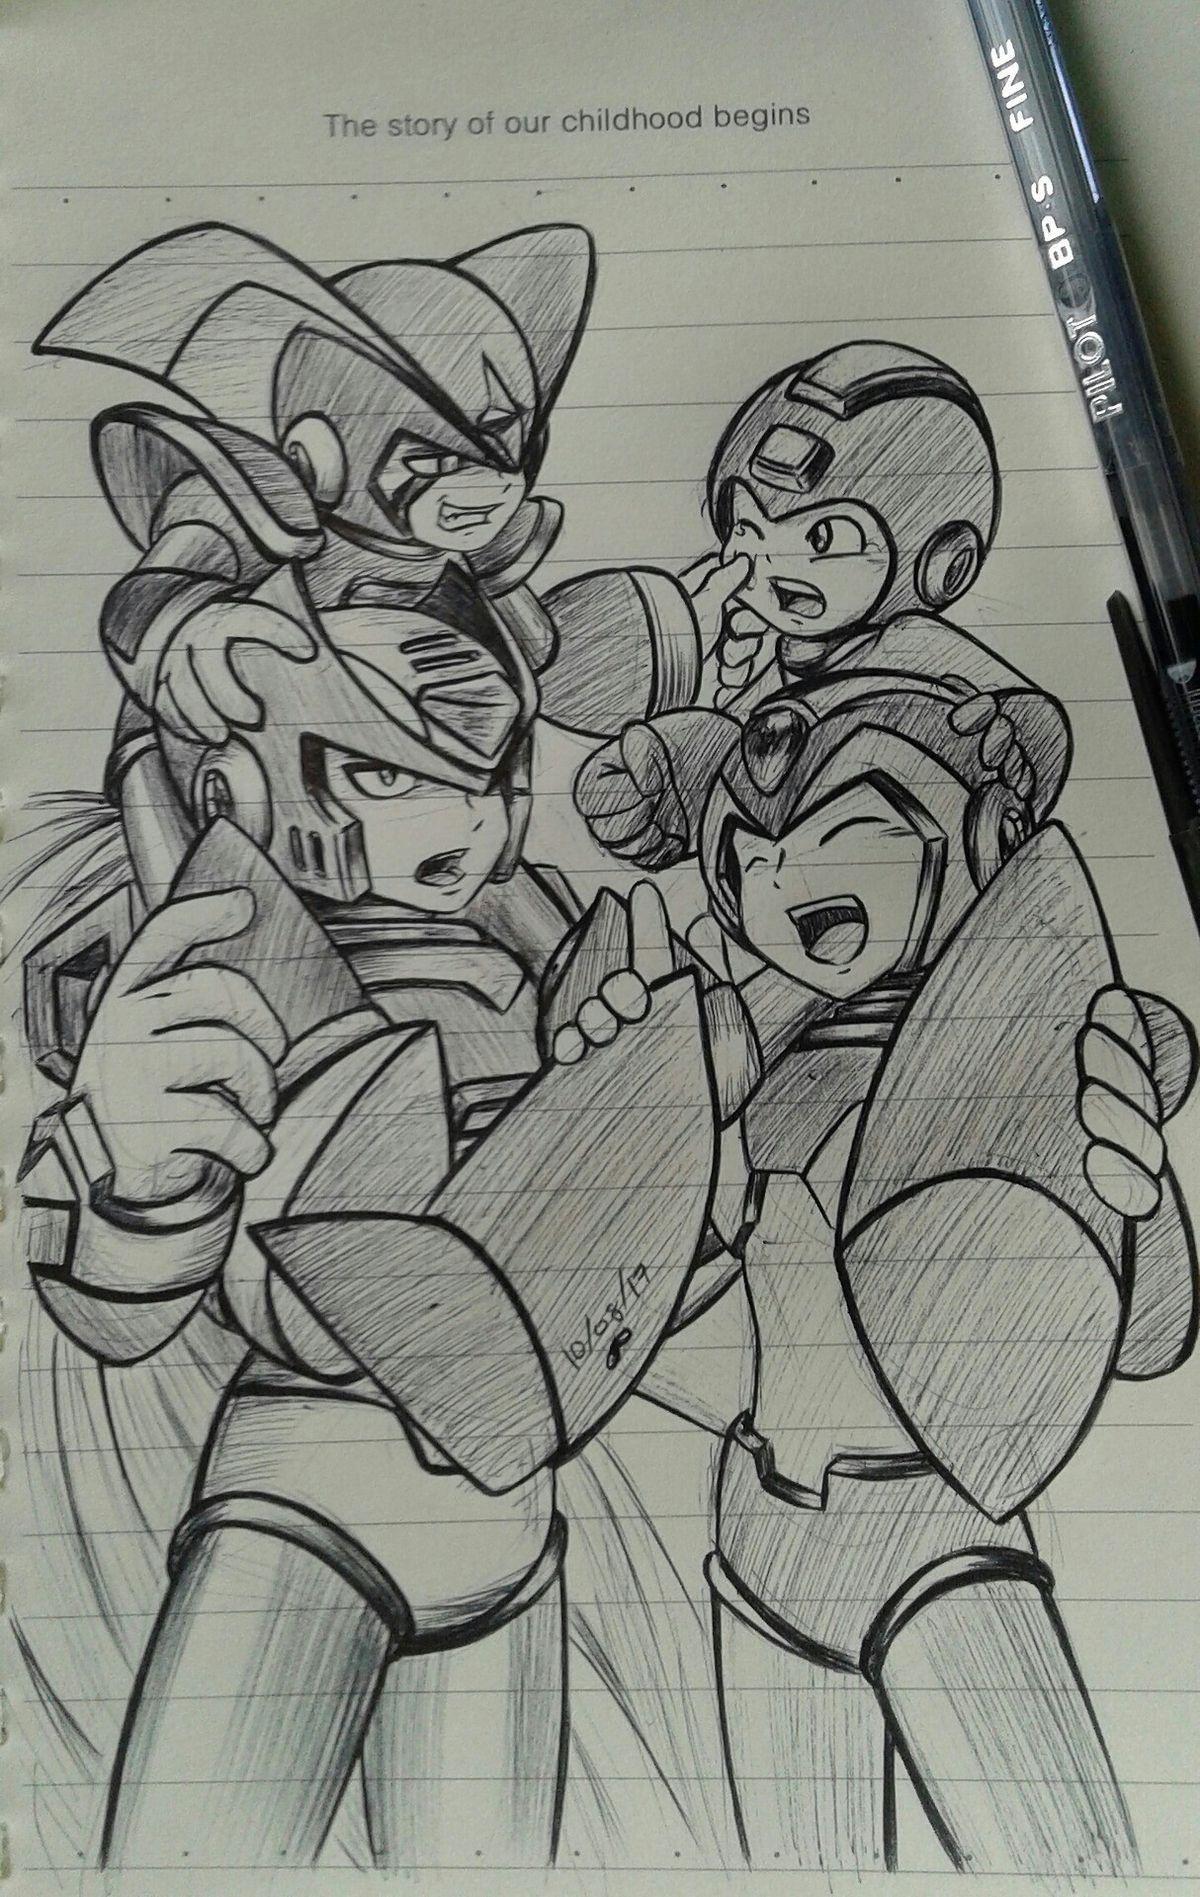 ASDFGHJKL//// Anime drawings, Dark art drawings, Anime art